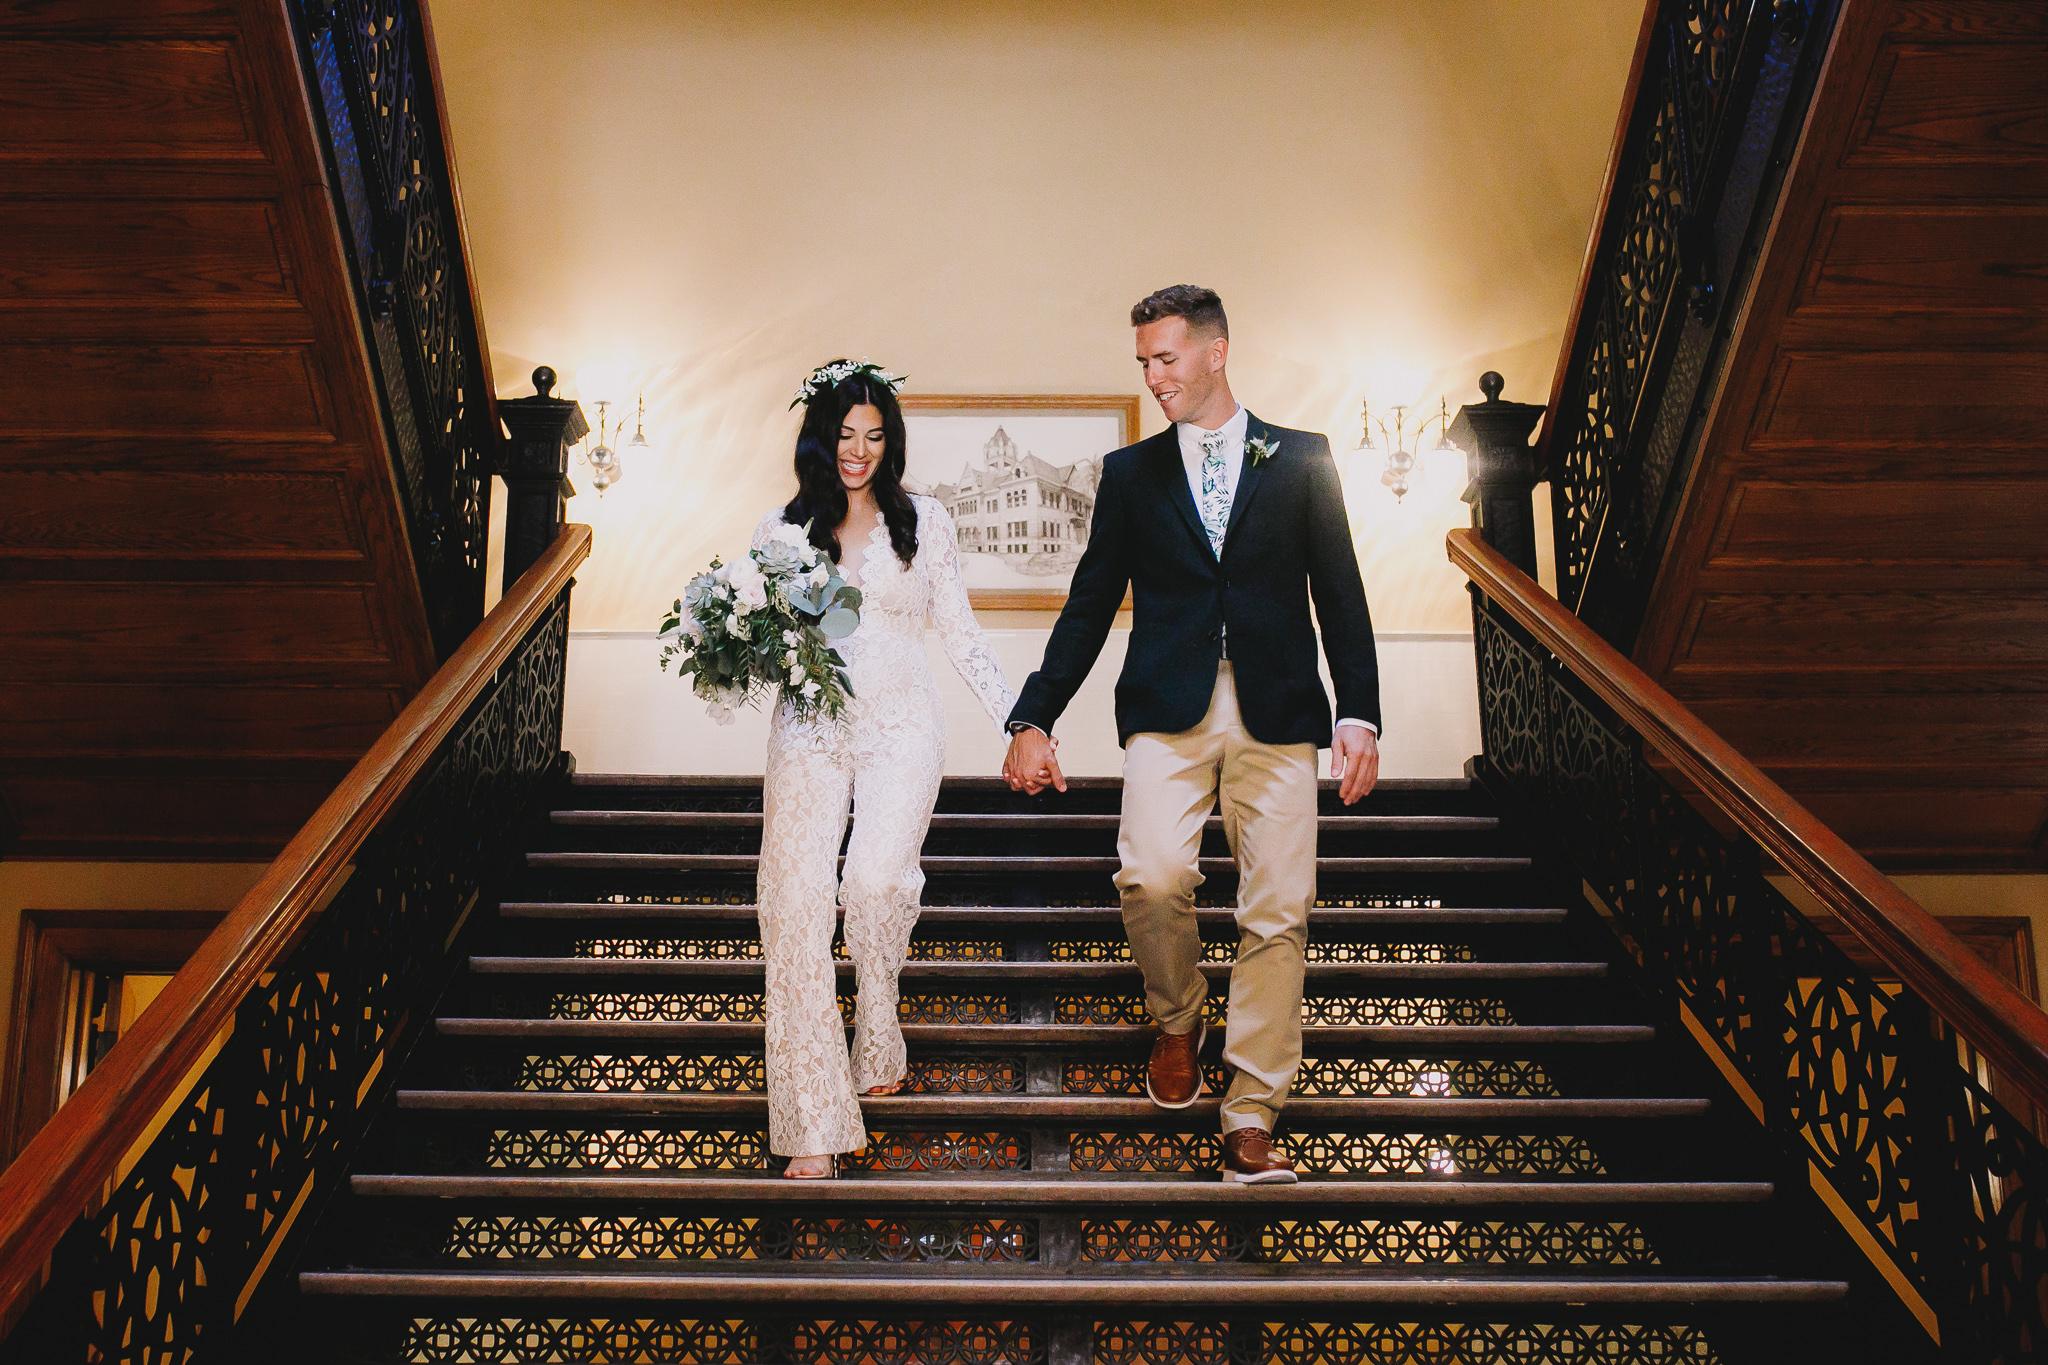 Archer Inspired Photography Lauren and Derek Long Beach Orange County Wedding Elopement-67.jpg